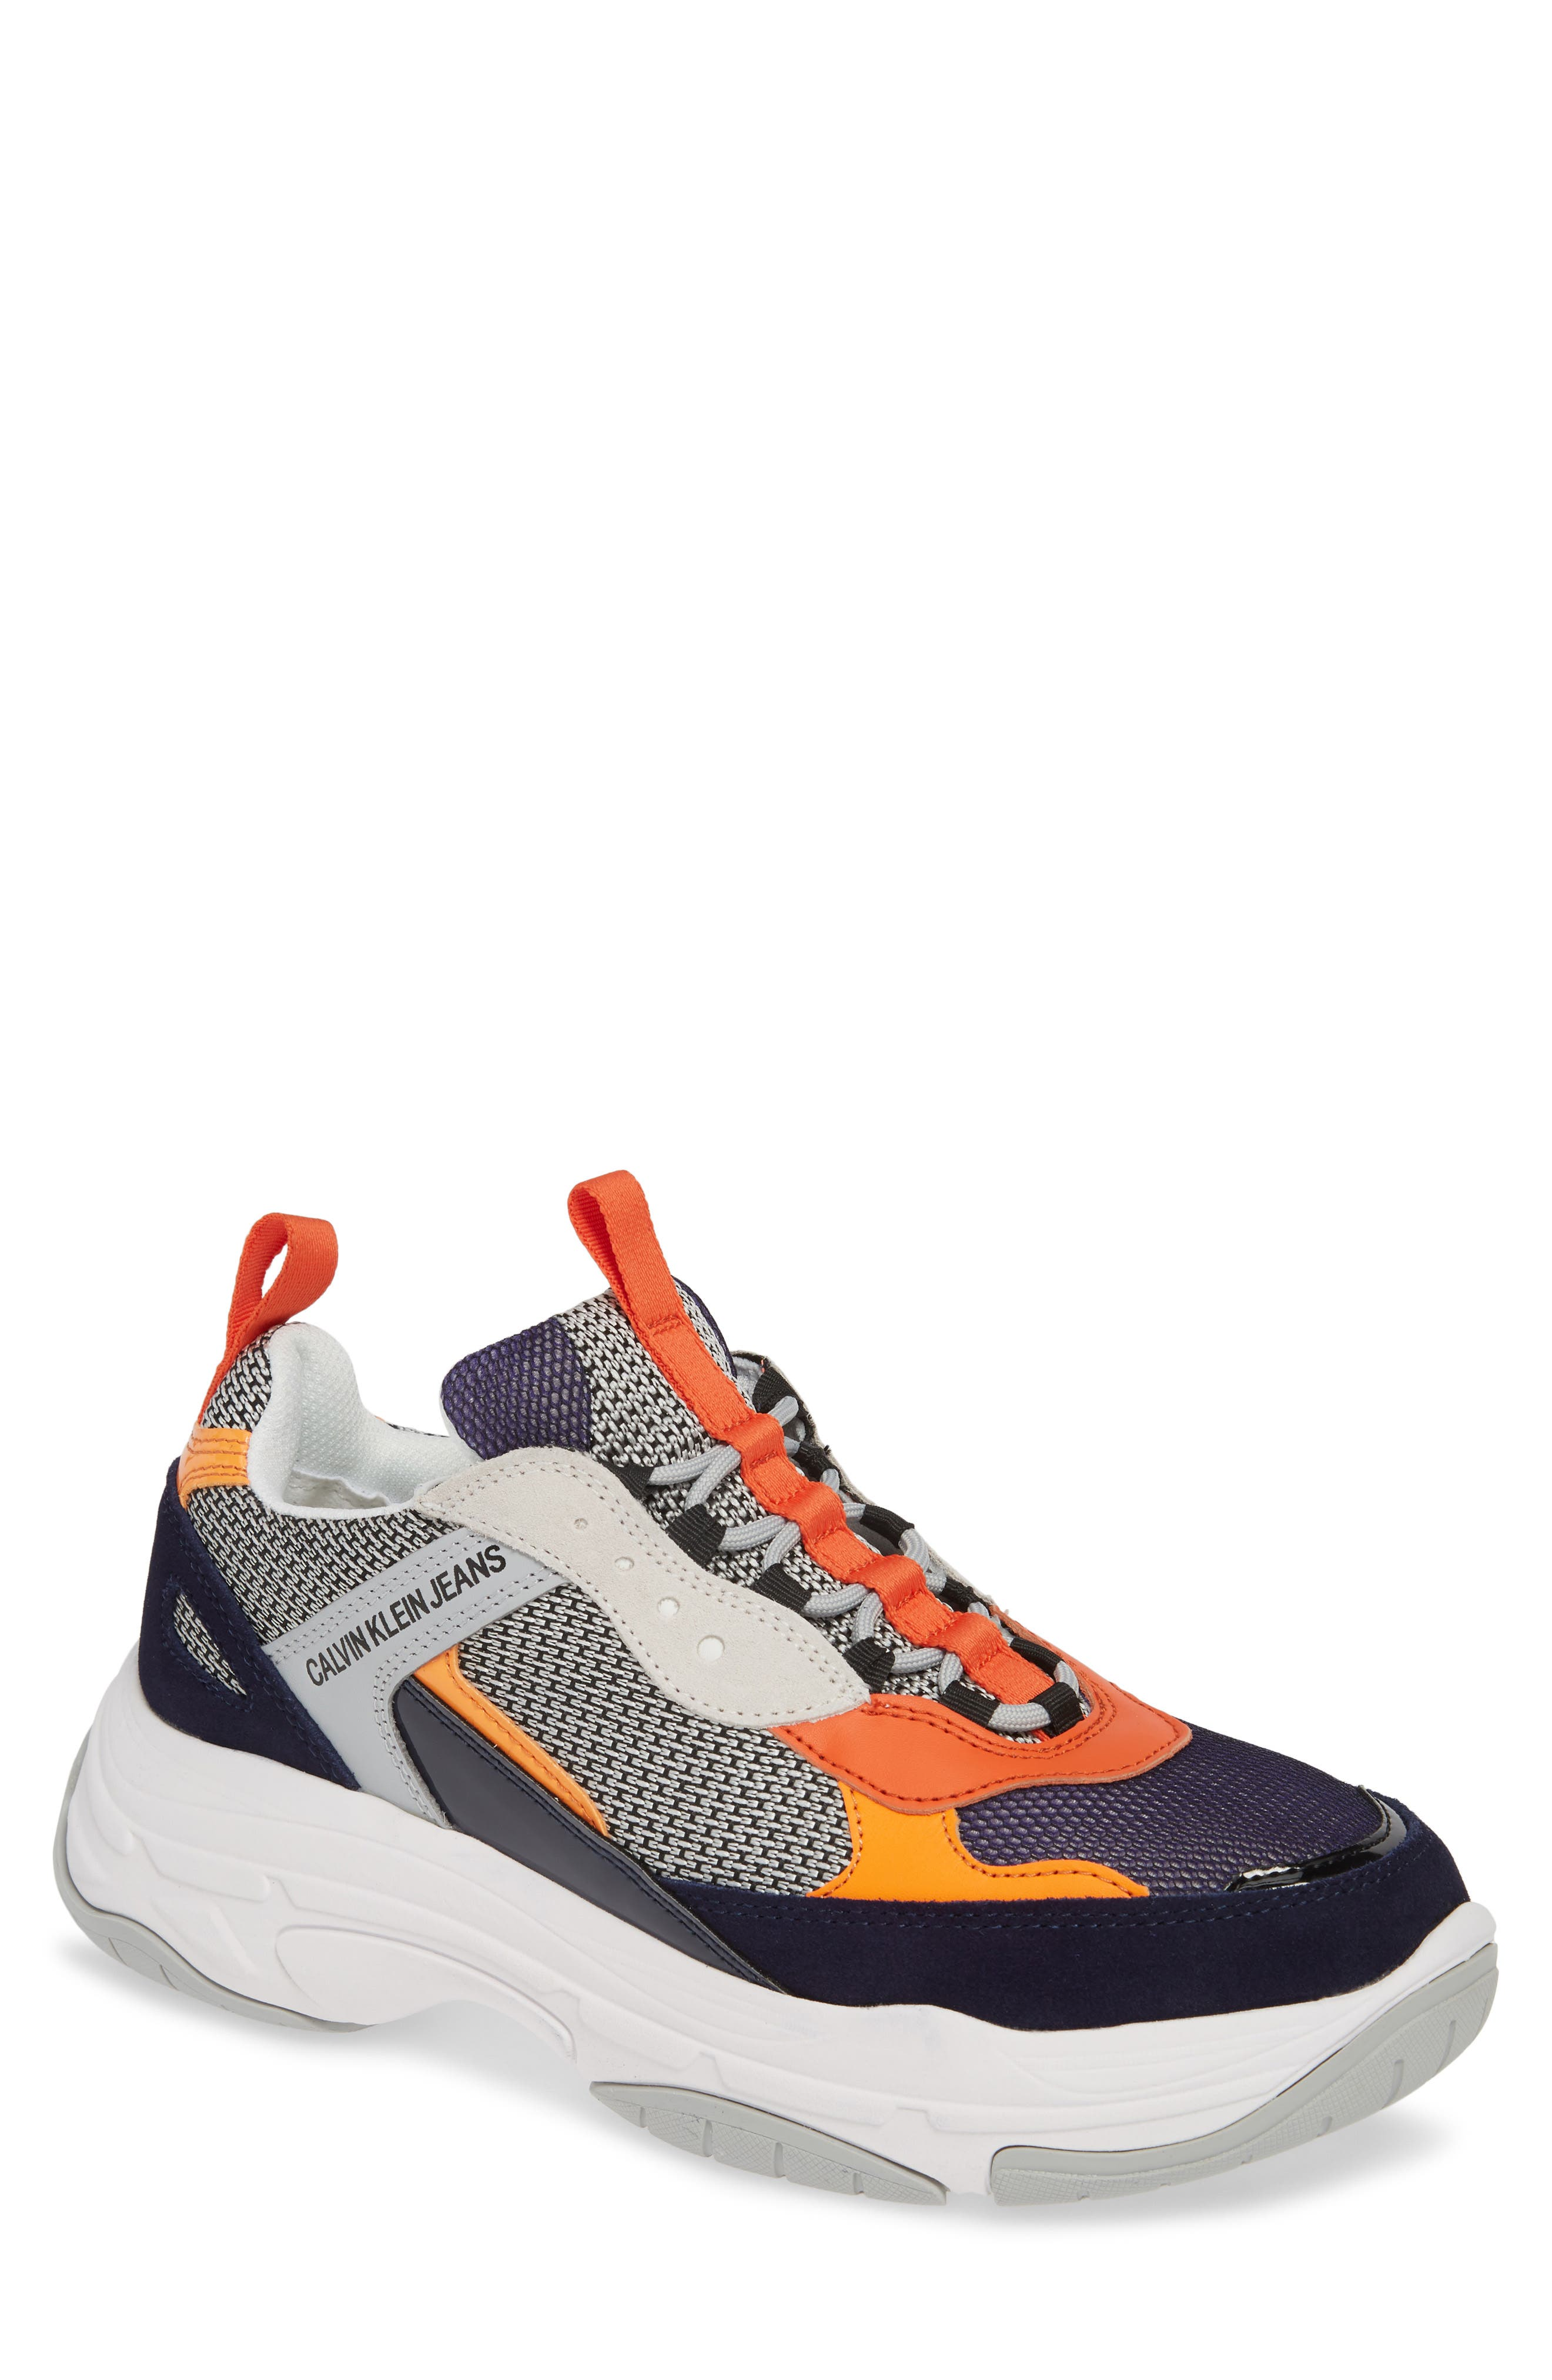 Calvin Klein Jeans Marvin Sneaker (Men